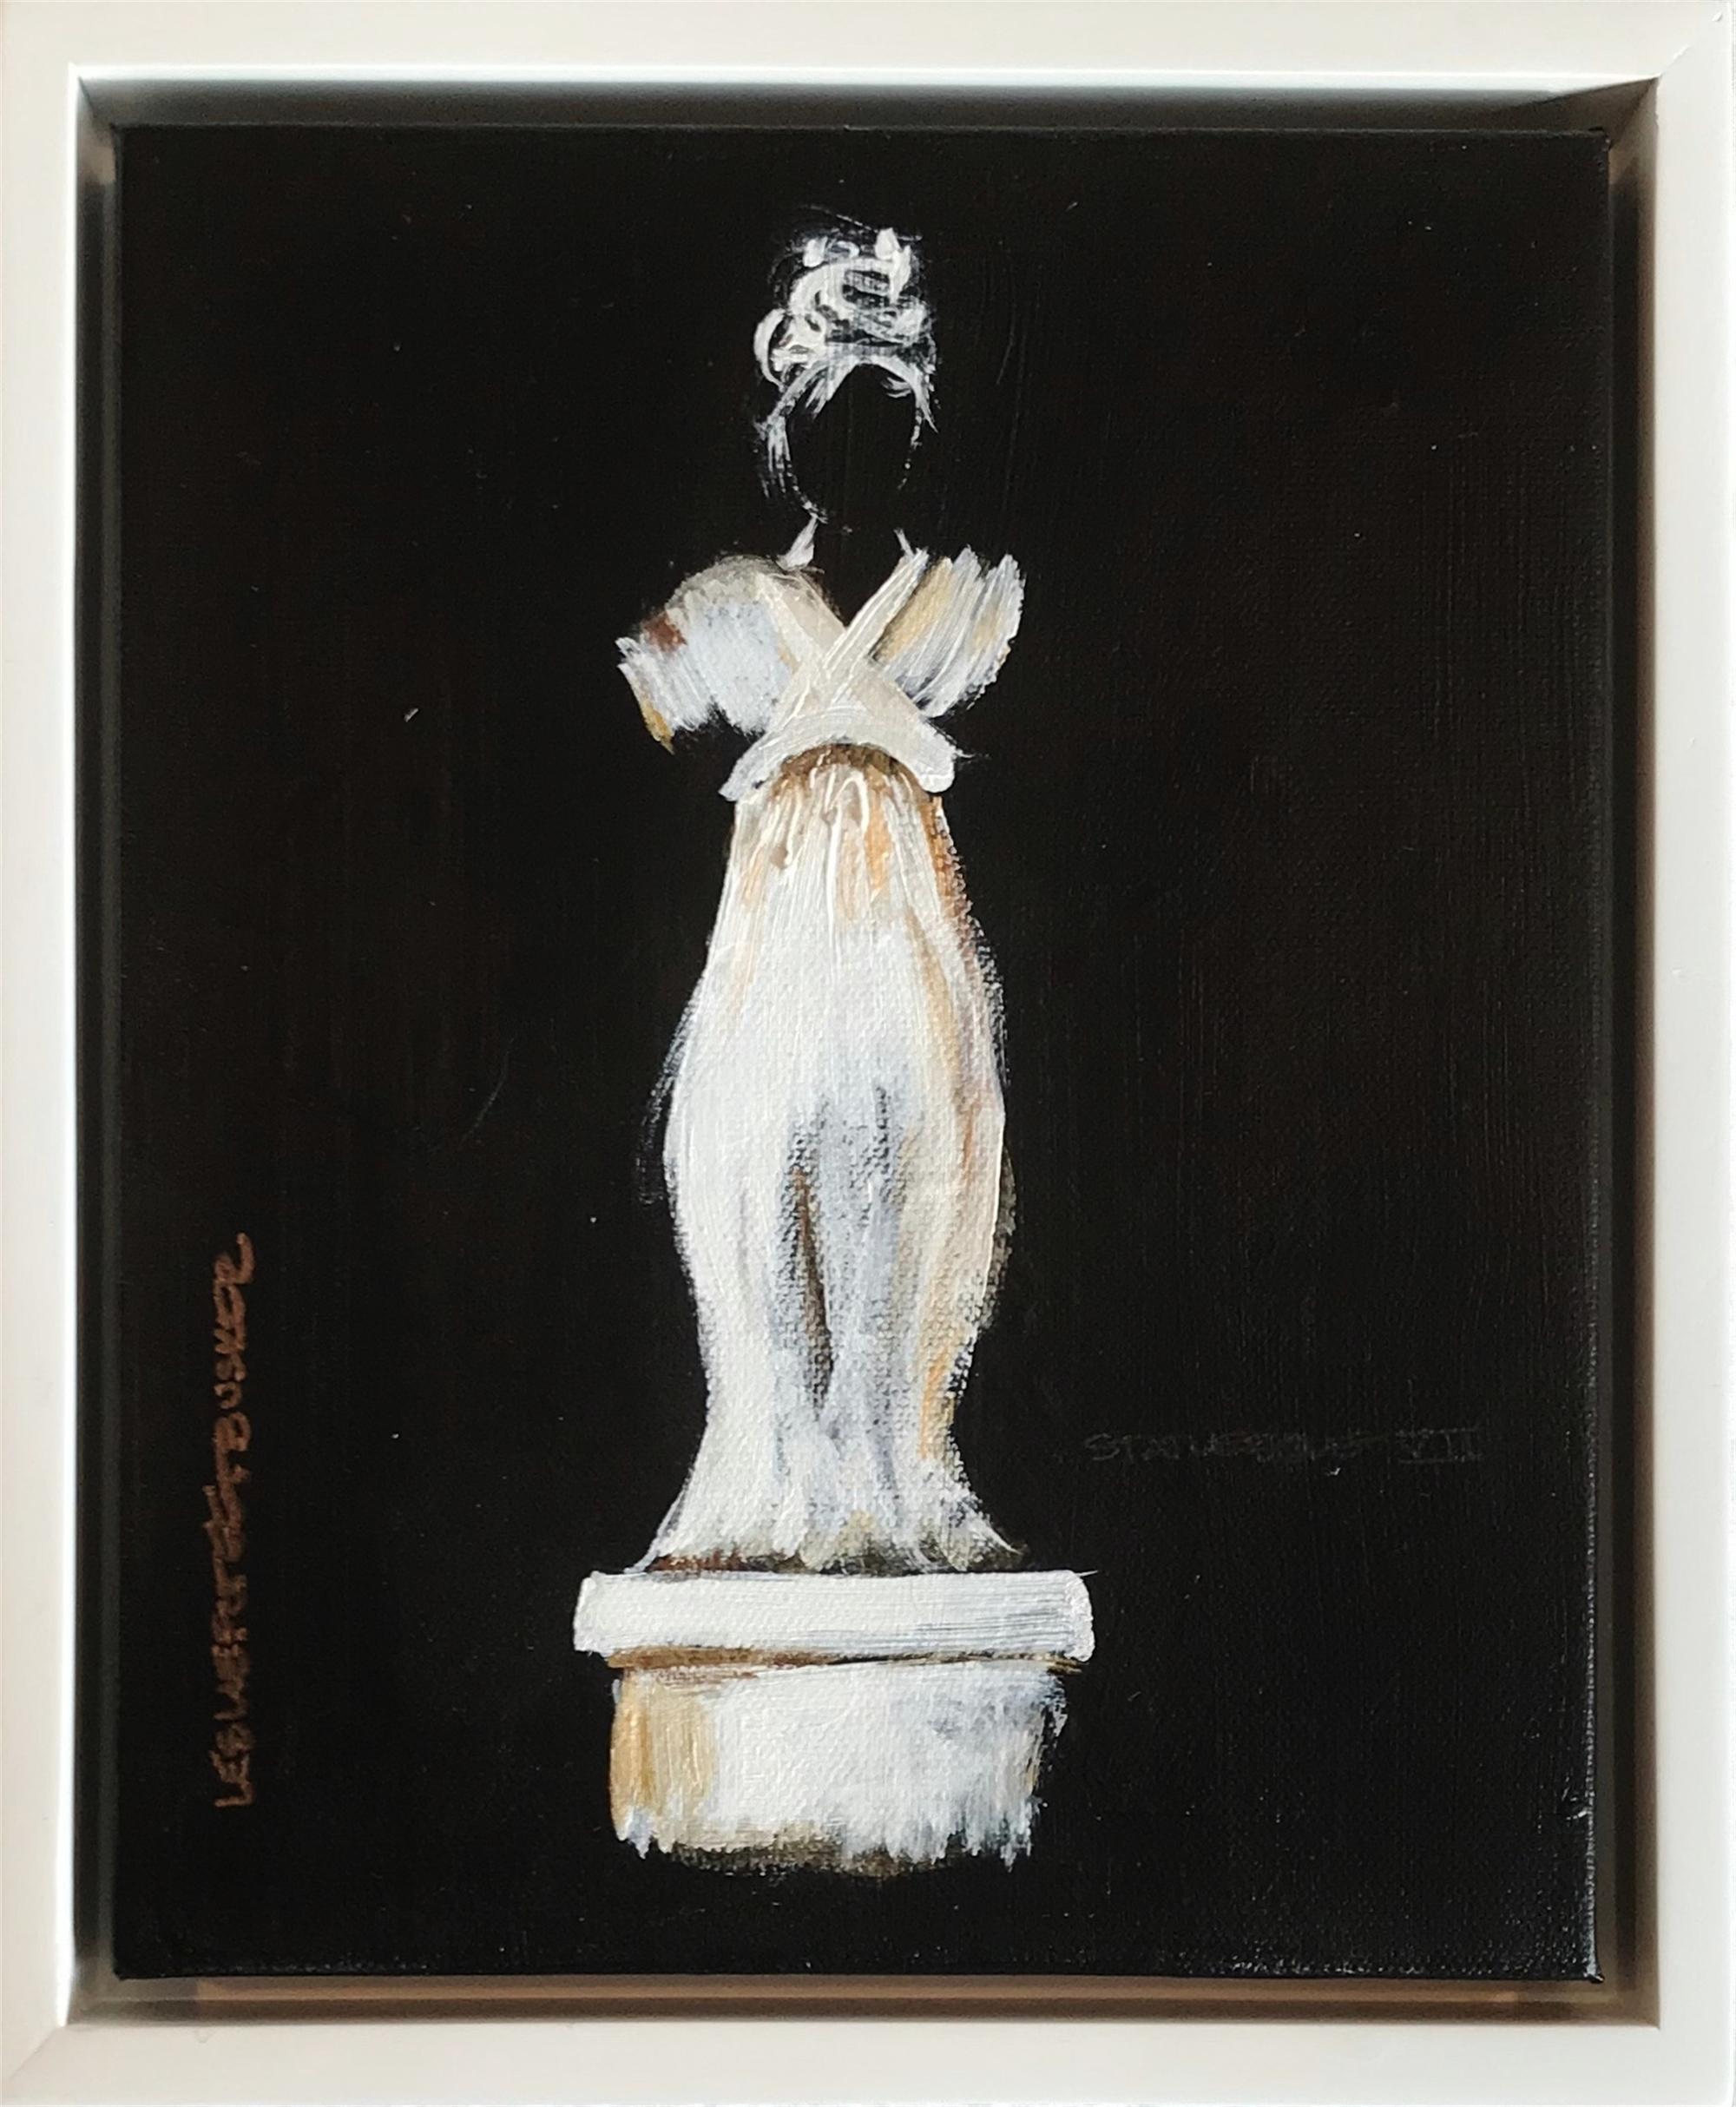 Statuesque VII by Leslie Poteet Busker